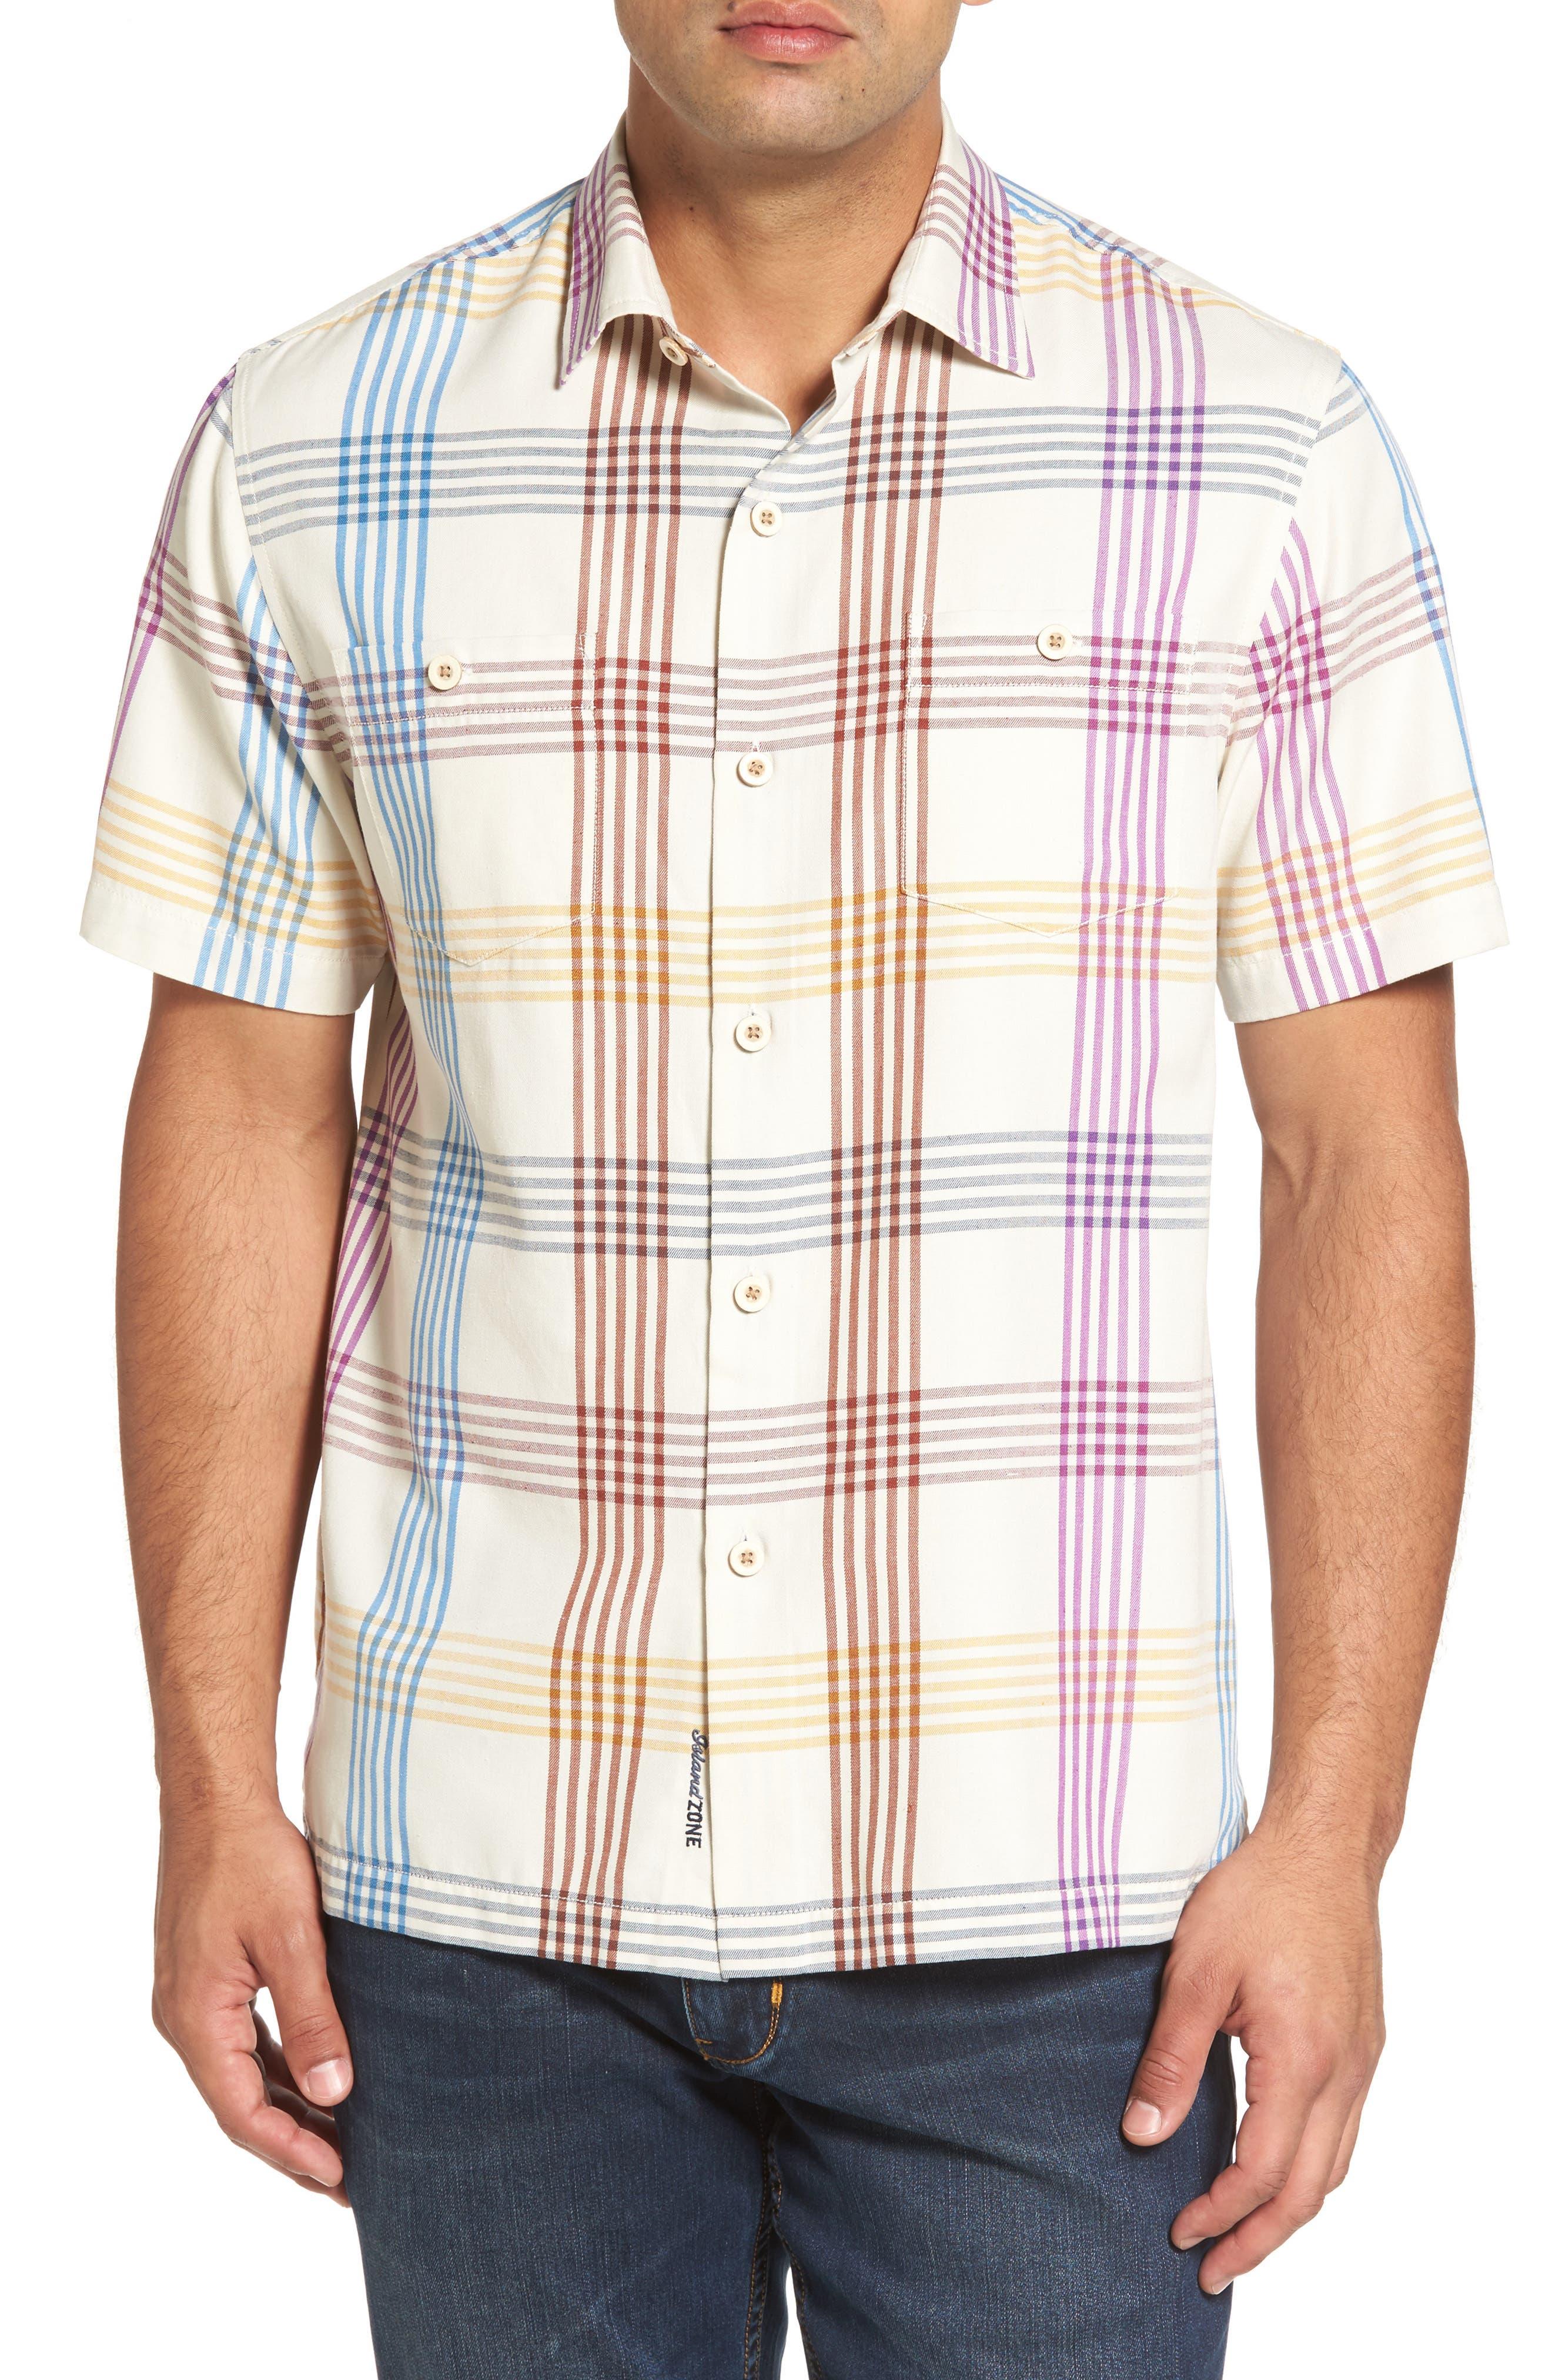 Main Image - Tommy Bahama Mo' Rockin Standard Fit Silk Woven Shirt